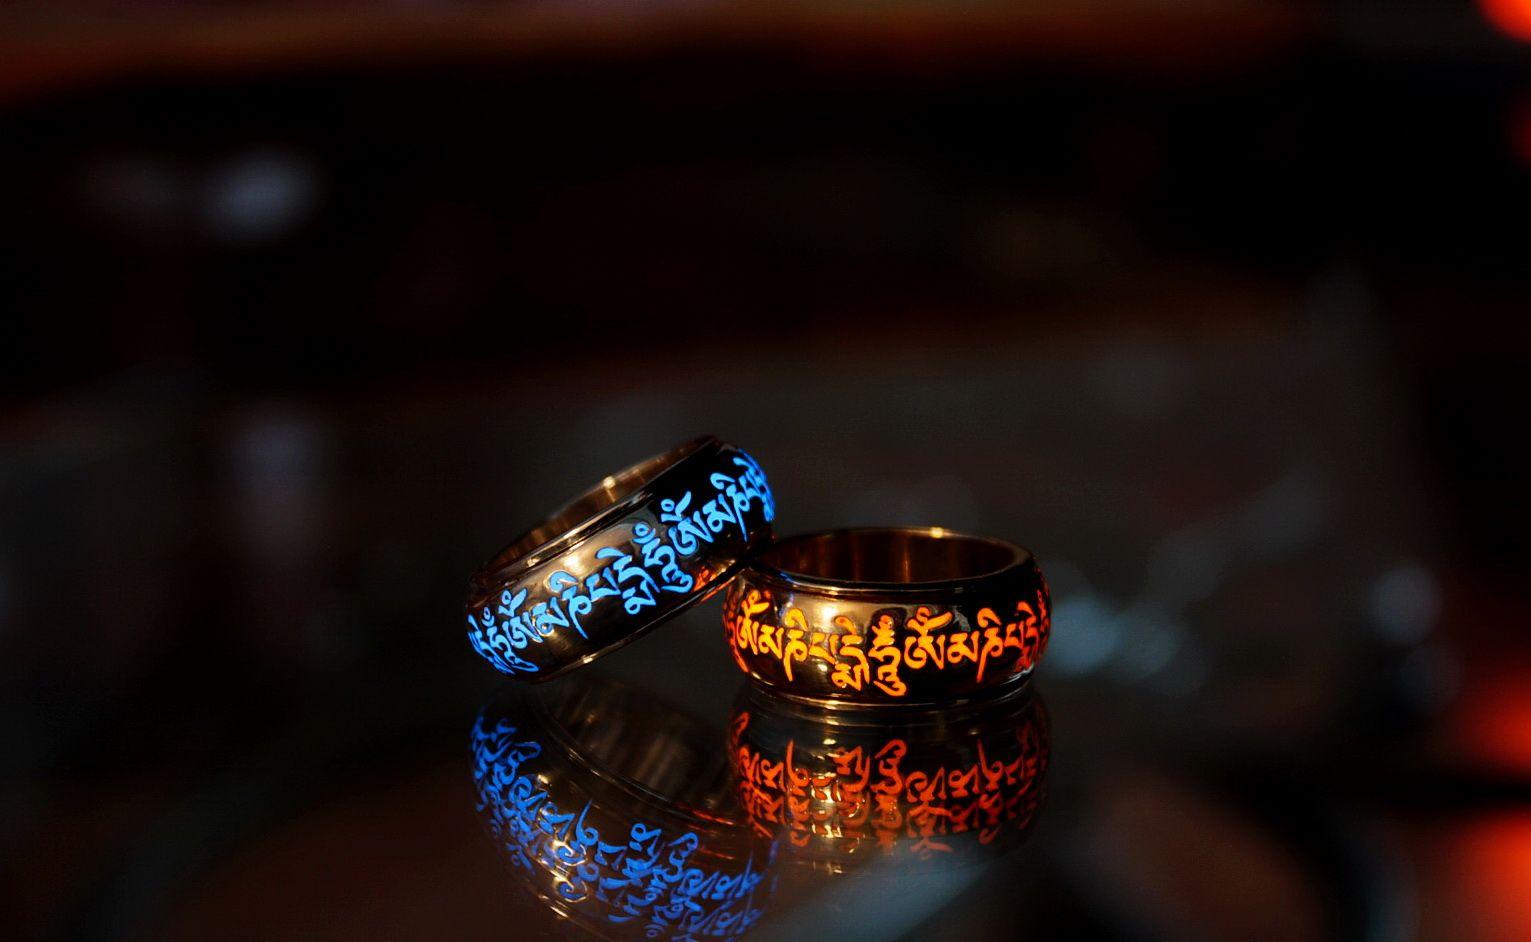 Om Mani Padme Hum Silver Ring Glow In The Dark Spinner Wheel